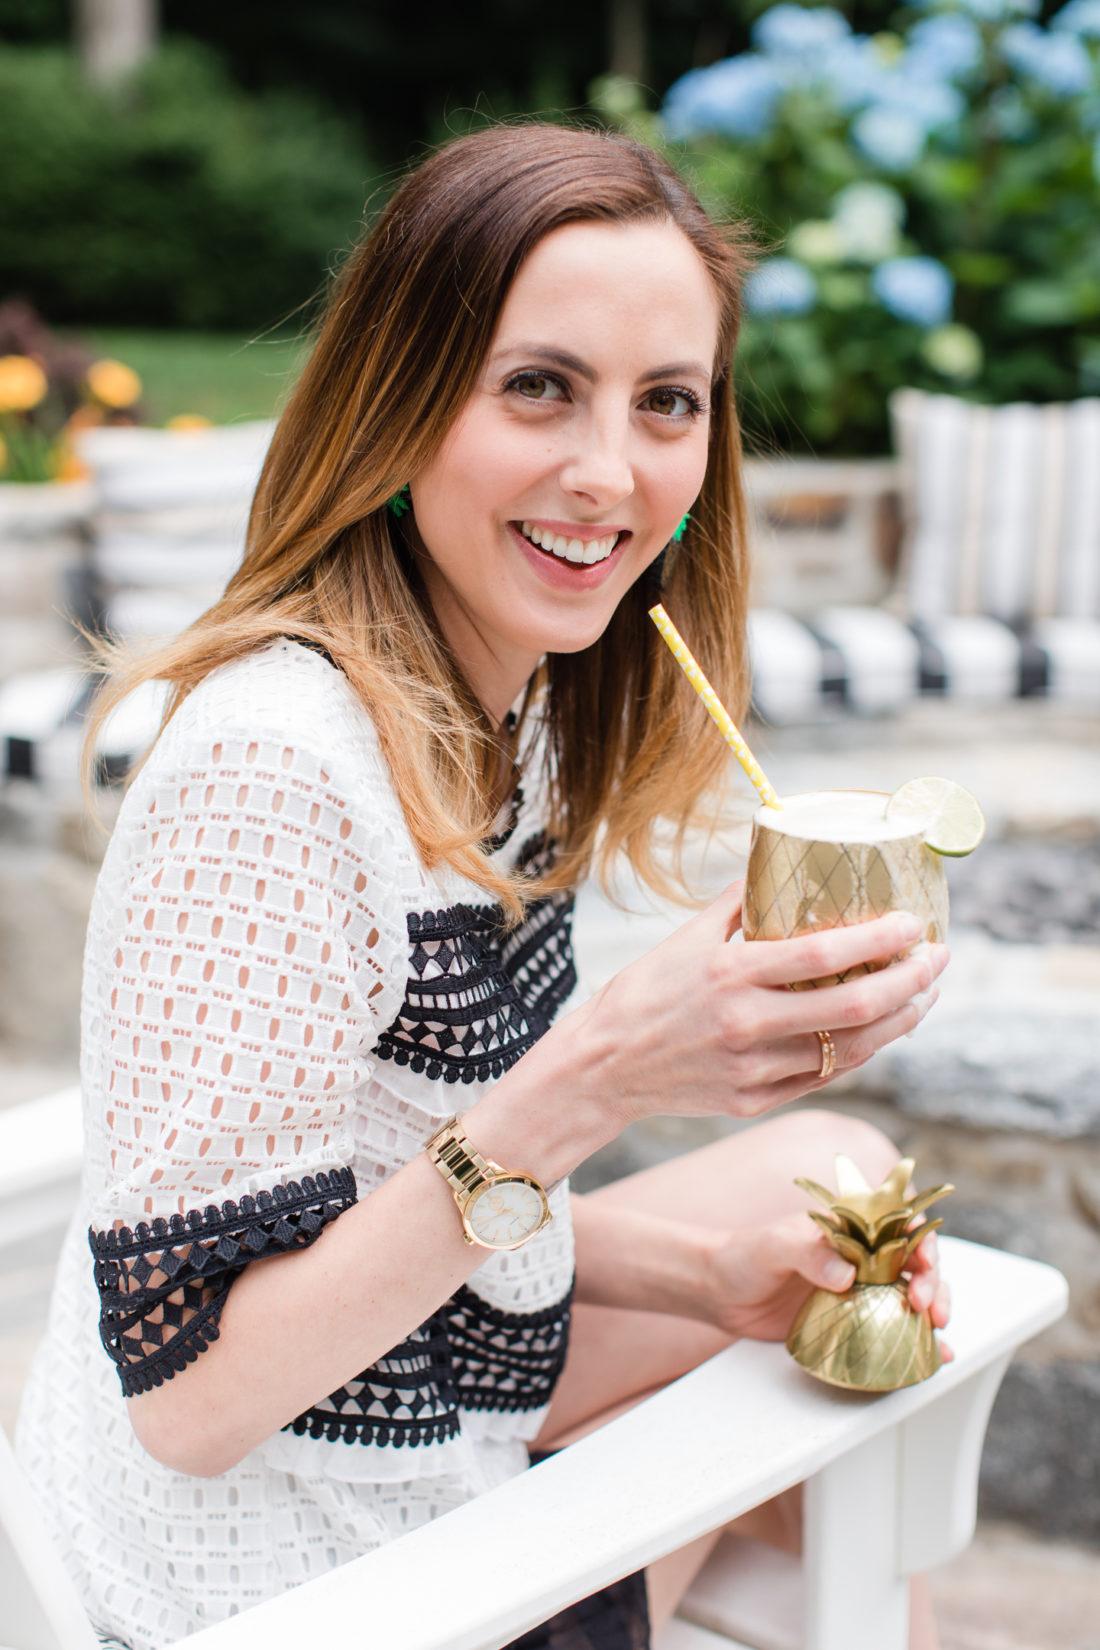 Eva Amurri Martino enjoys a frozen pineapple daquiri at her Pineapple themed Happy Hour